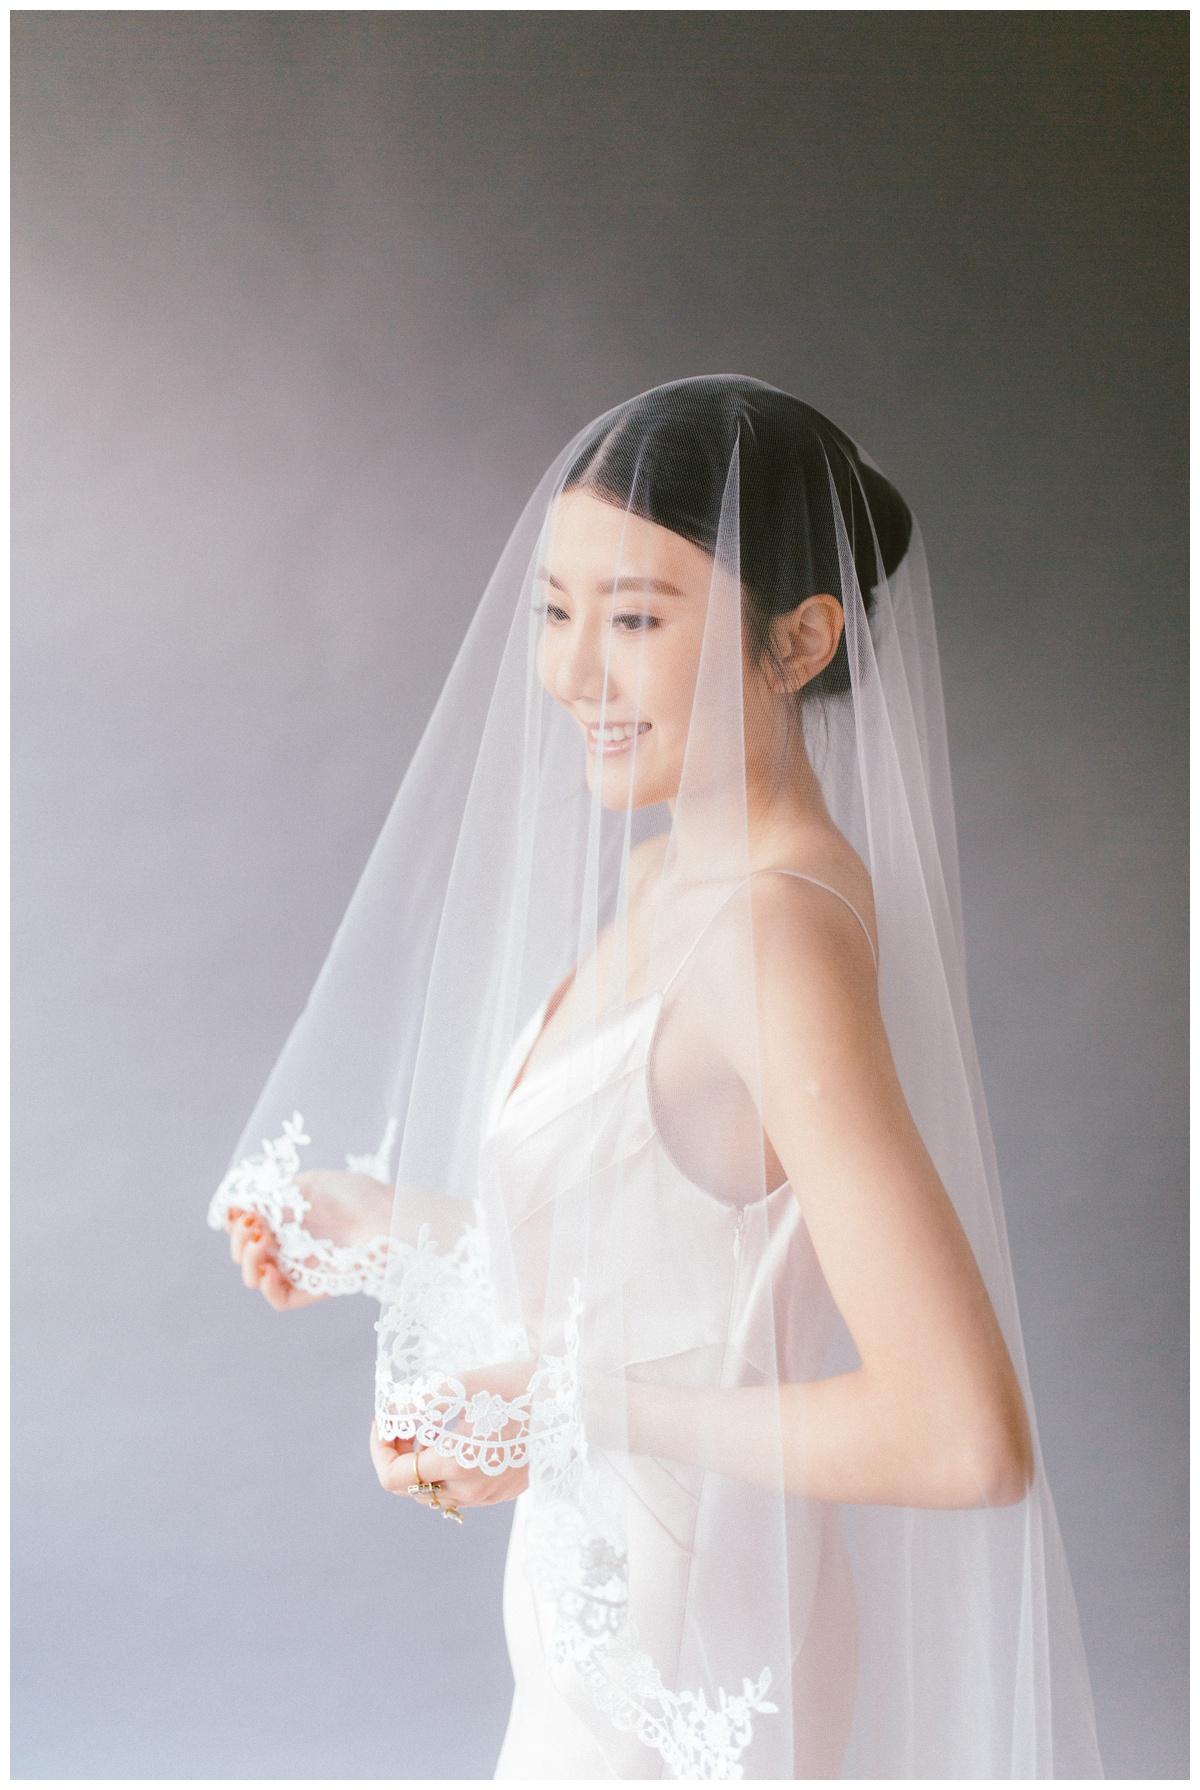 Mattie C. Fine Art Wedding Prewedding Photography Vancouver and Hong Kong 65.jpg